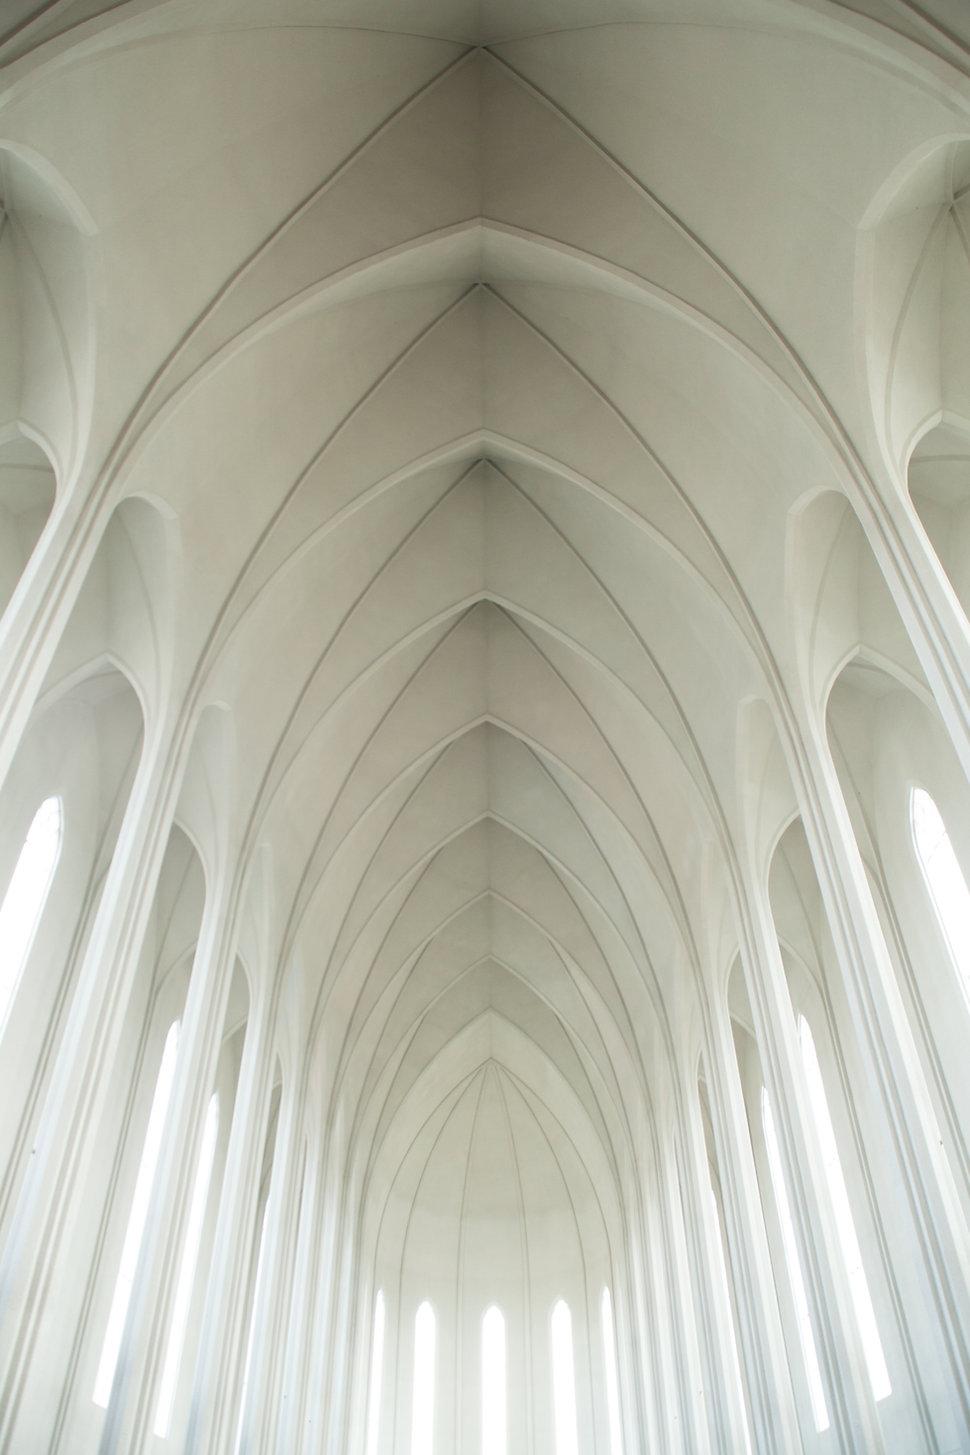 Plafond blanc arquéesLes